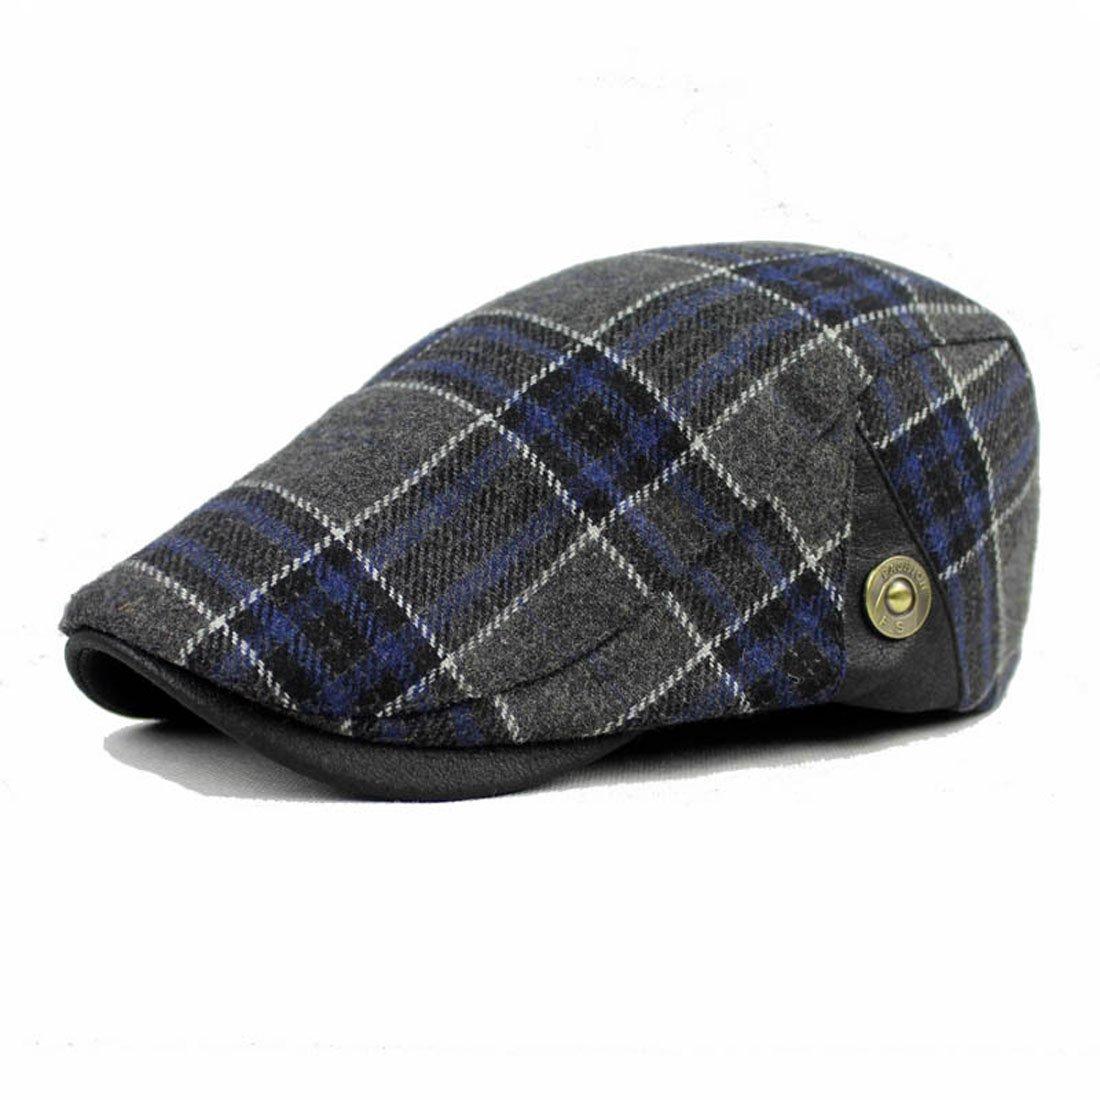 King Star Men Wool Blend Checked Classic Flat Ivy Newsboy Hat H17060704-2